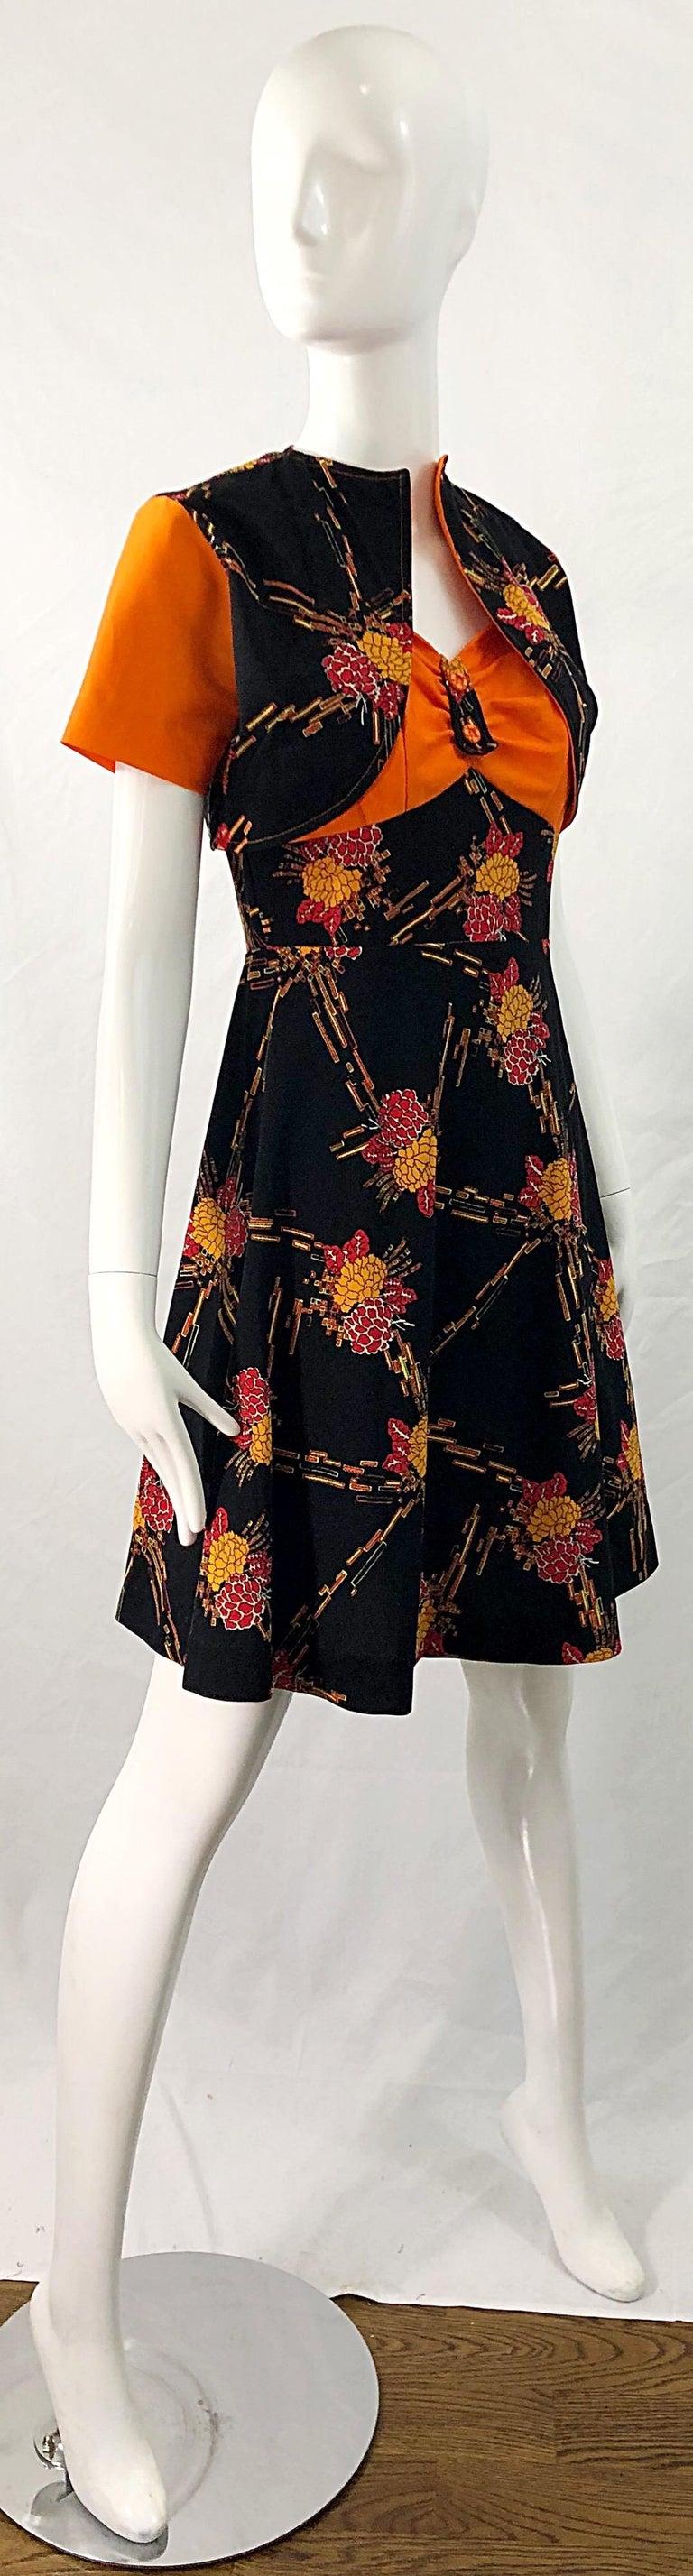 1970s Autumnal Digital Floral Print Knit Vintage 70s A Line Dress + Bolero Top For Sale 2